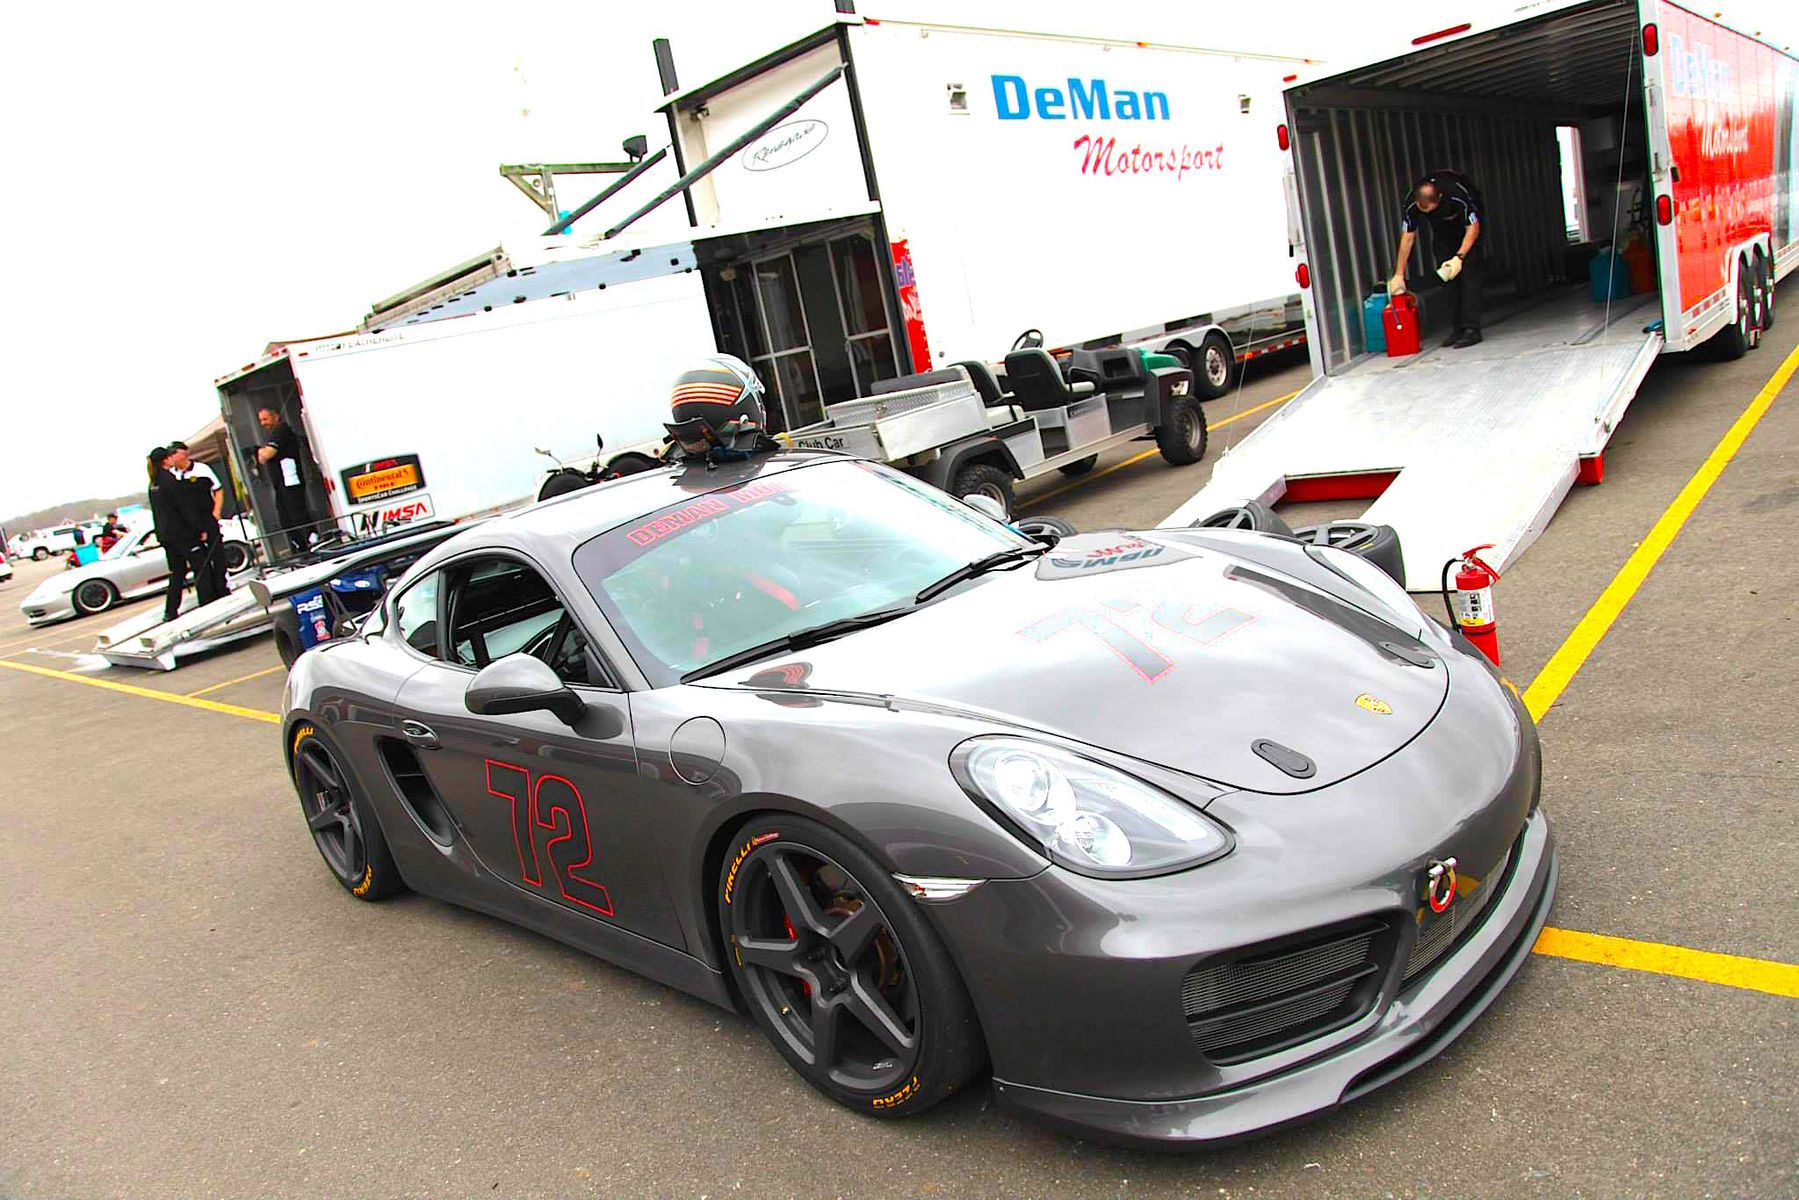 2015 Porsche Cayman S   Track-prepped Porsche Cayman S by DeMan Motorsport on Forgeline CF1R Open Lug Wheels